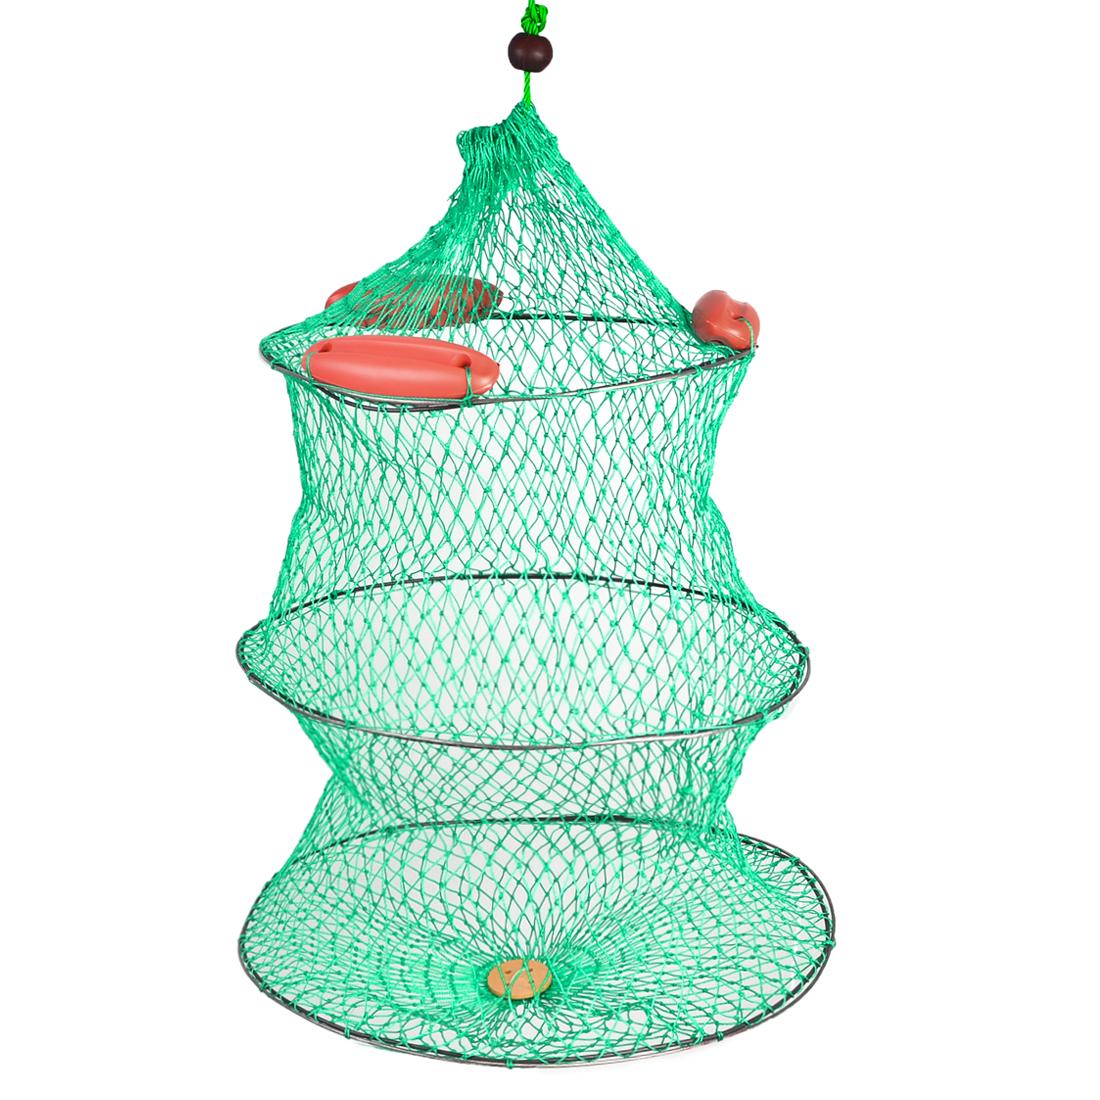 Green Drawstring Closure Shrimp Crab 2 Layers Fishing Net